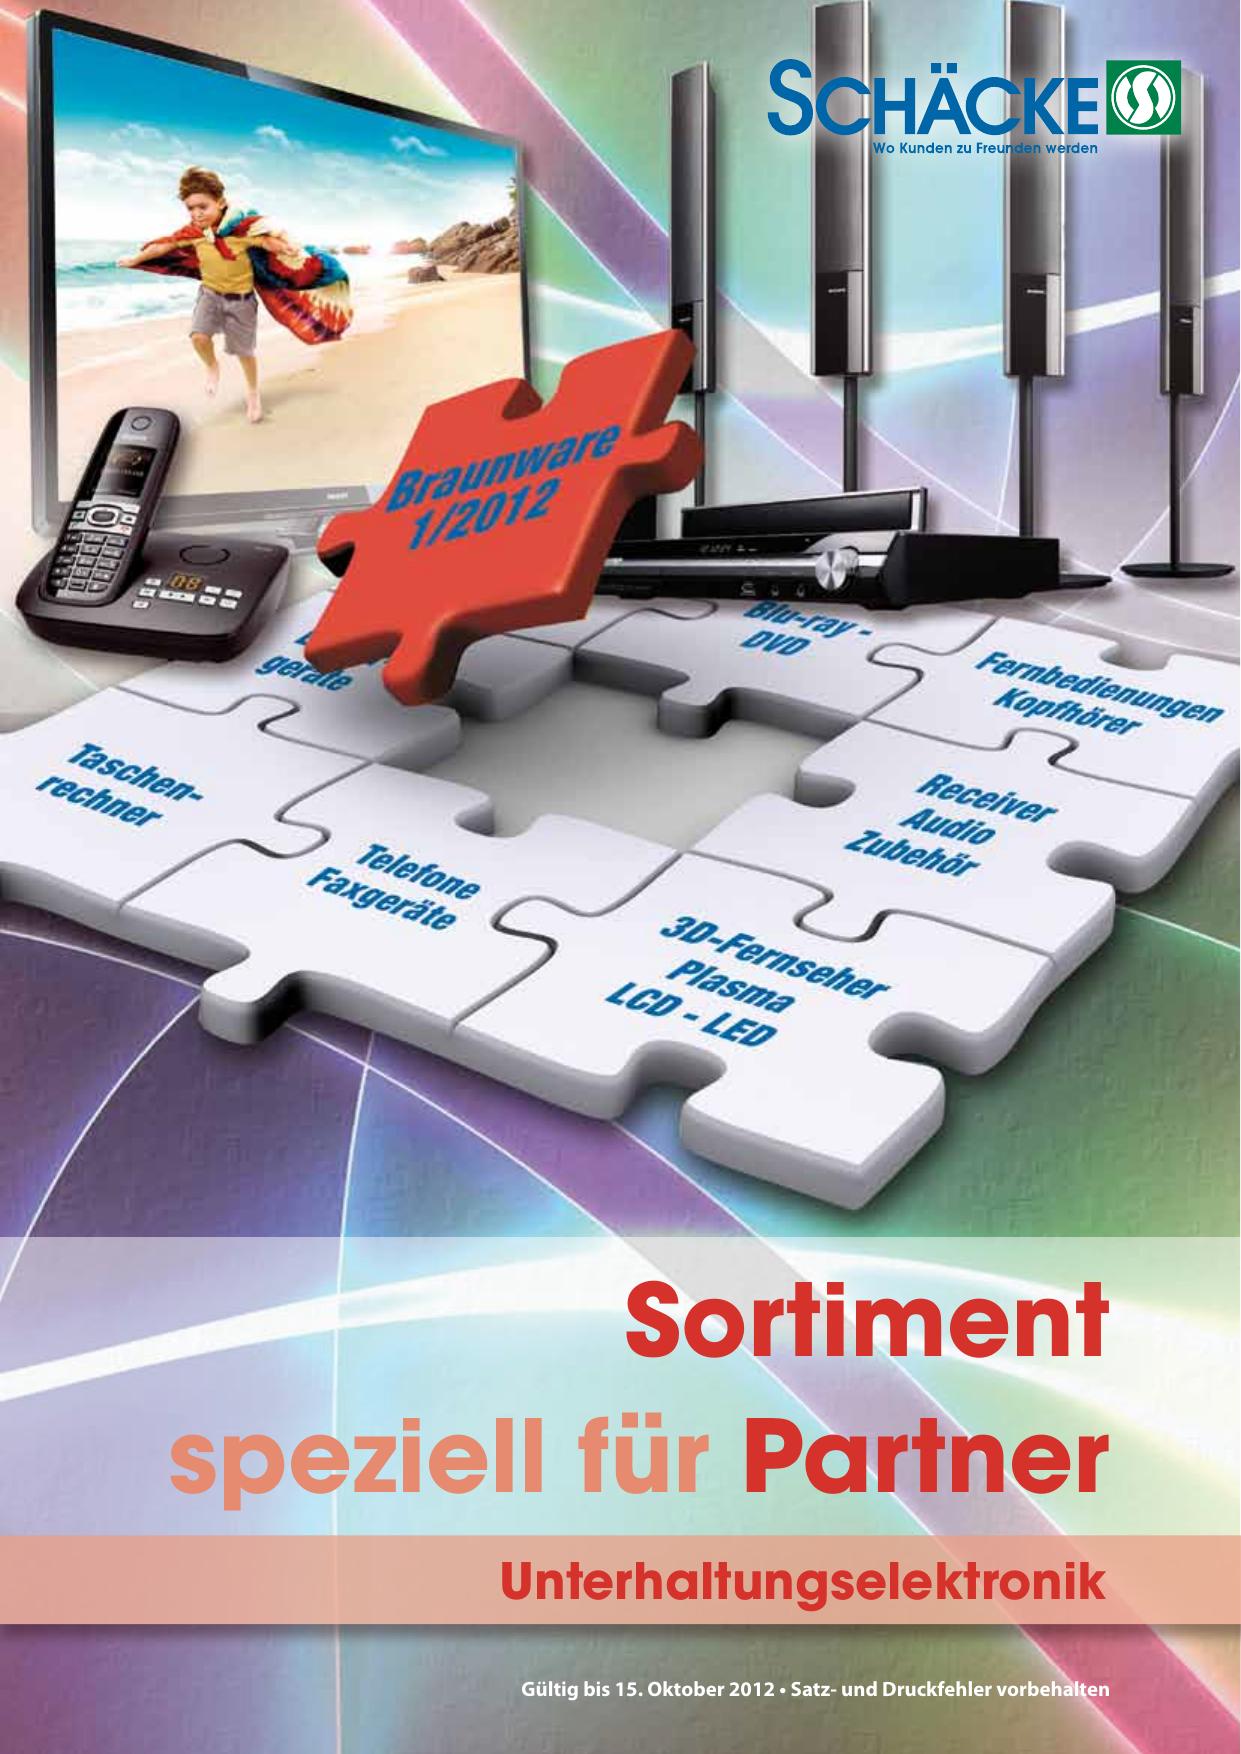 Sortiment speziell für Partner | manualzz.com